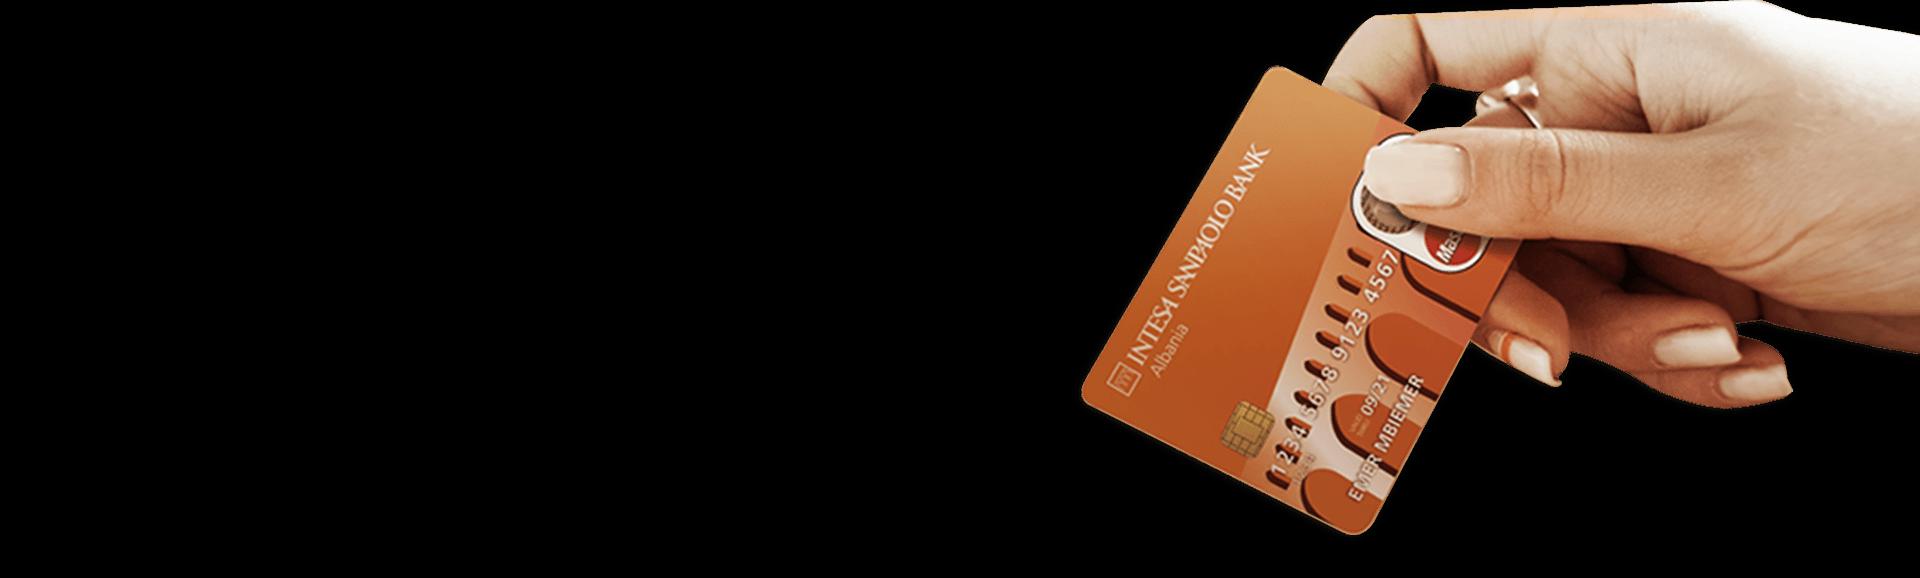 MasterCard Standart